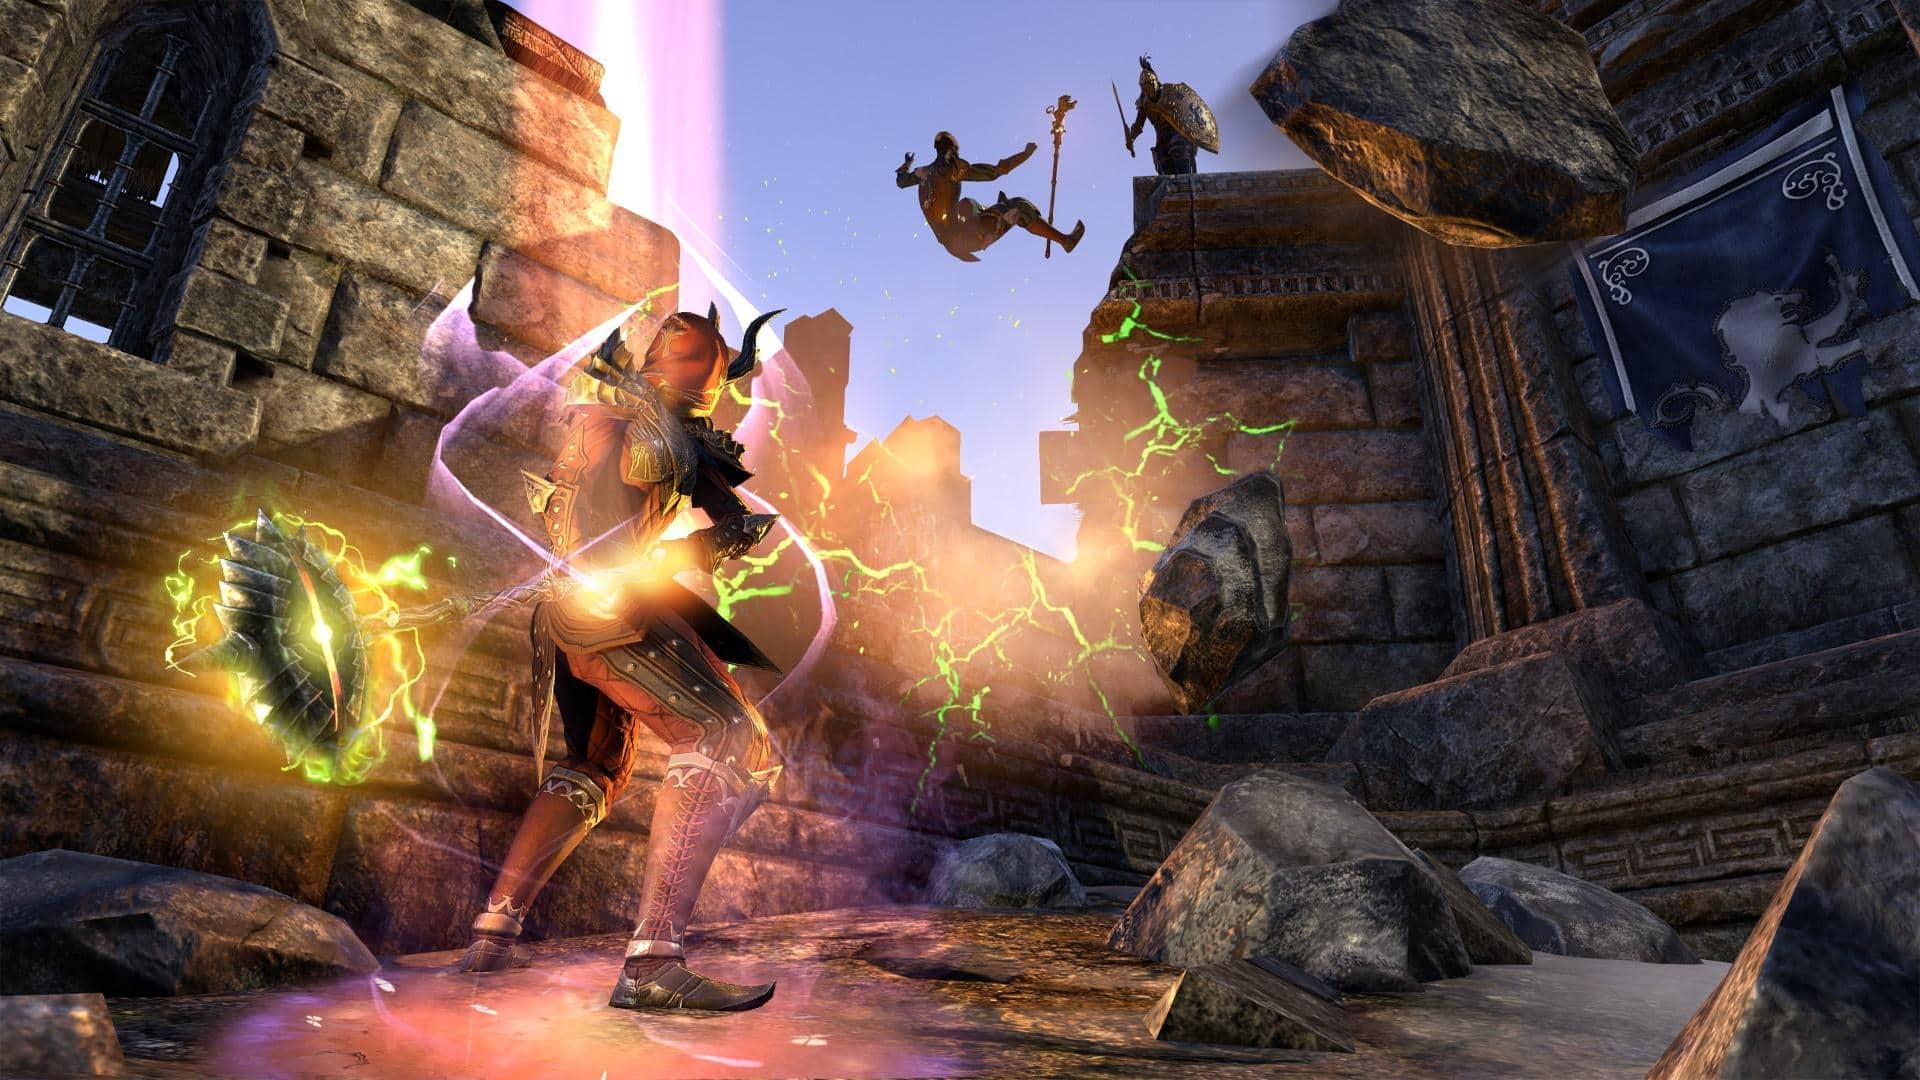 Cyrodiil + Elsweyr = Chaos! - Sanguine's Sentinels